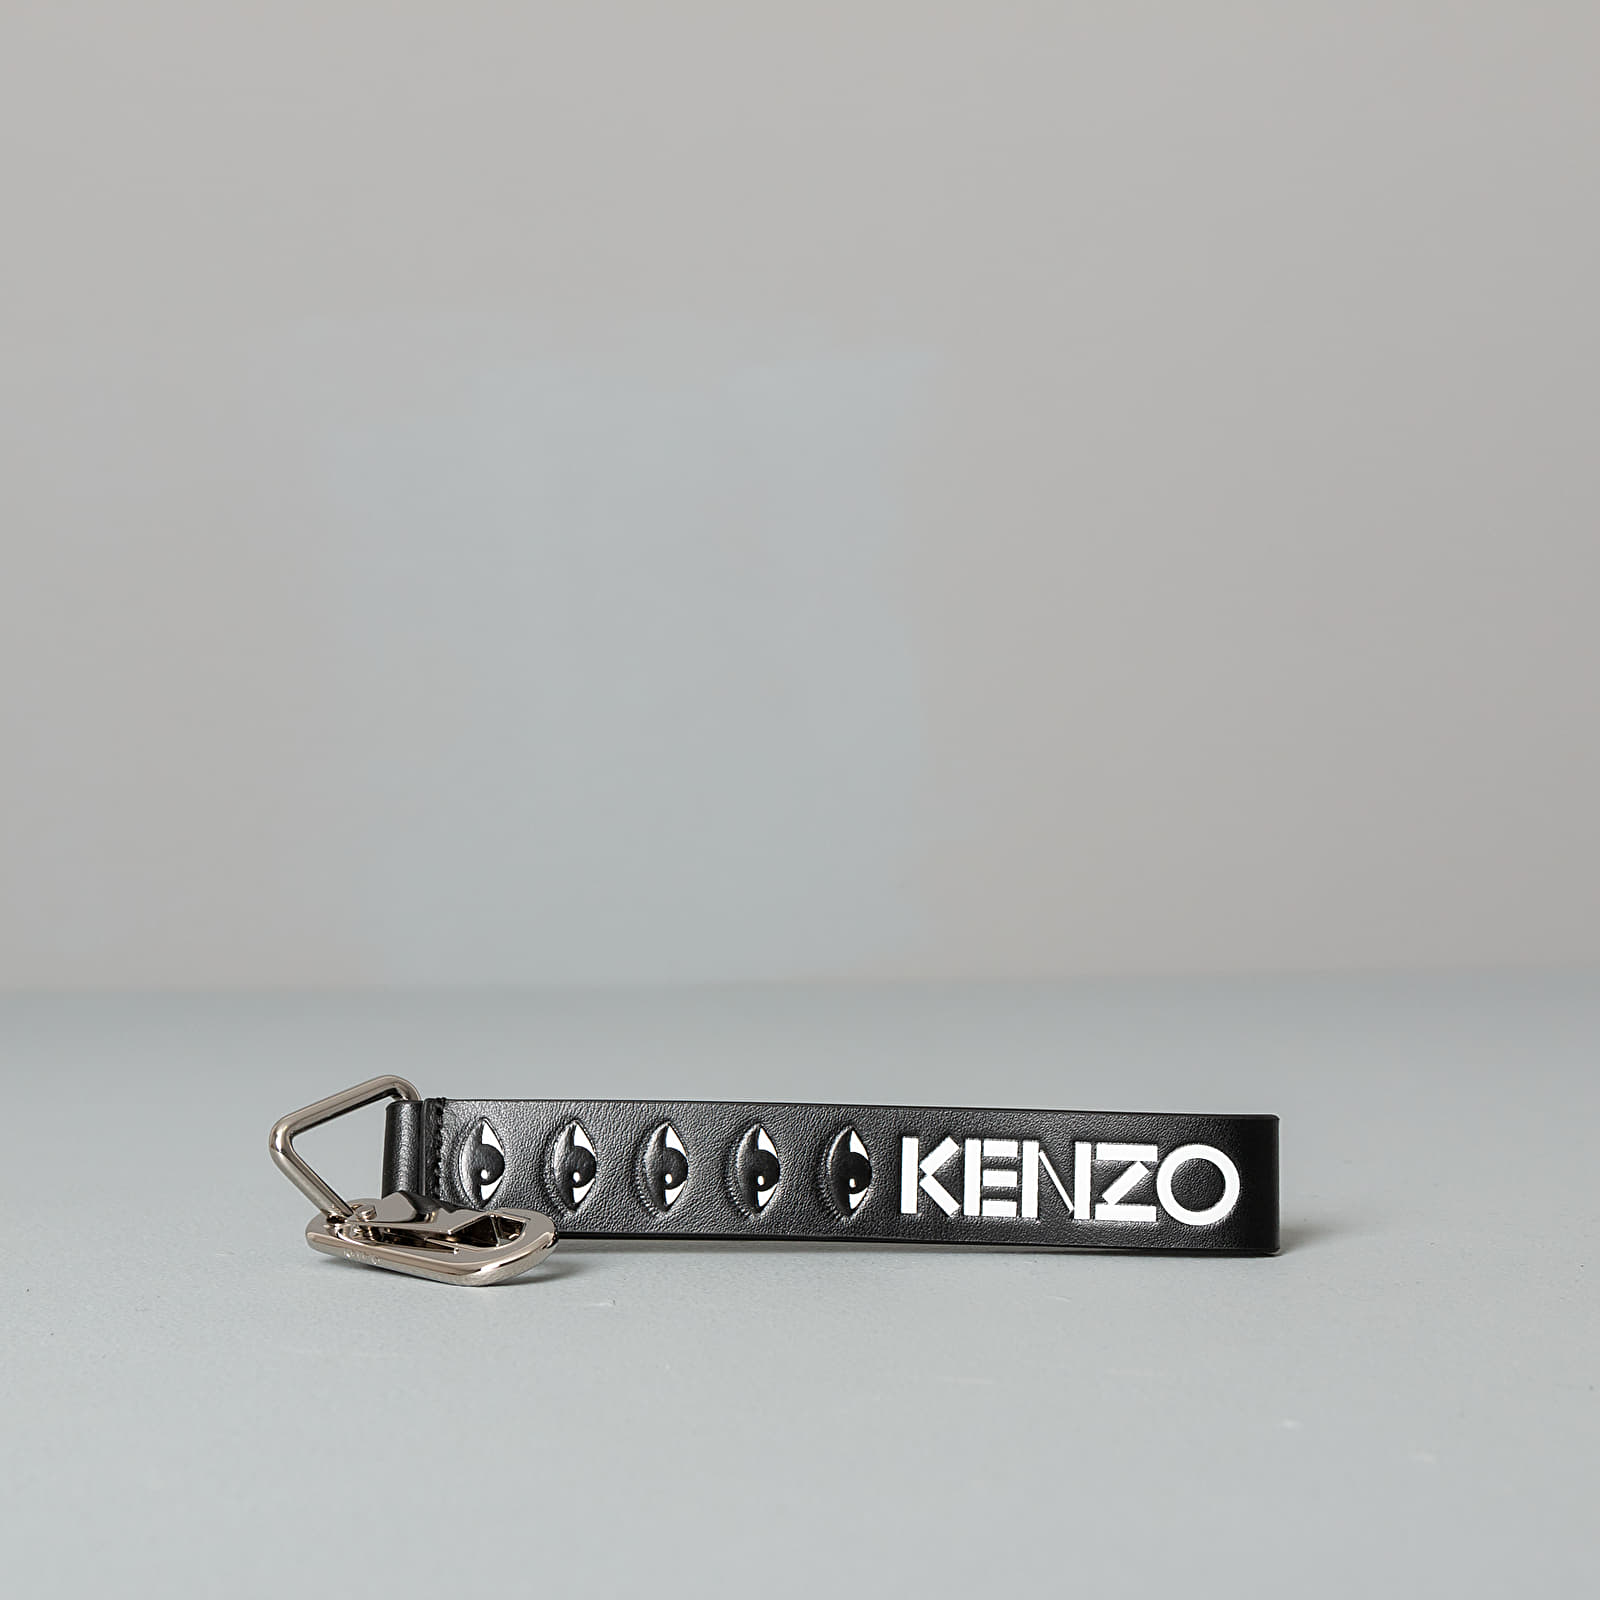 KENZO Multi-Eye Lock Wristlet